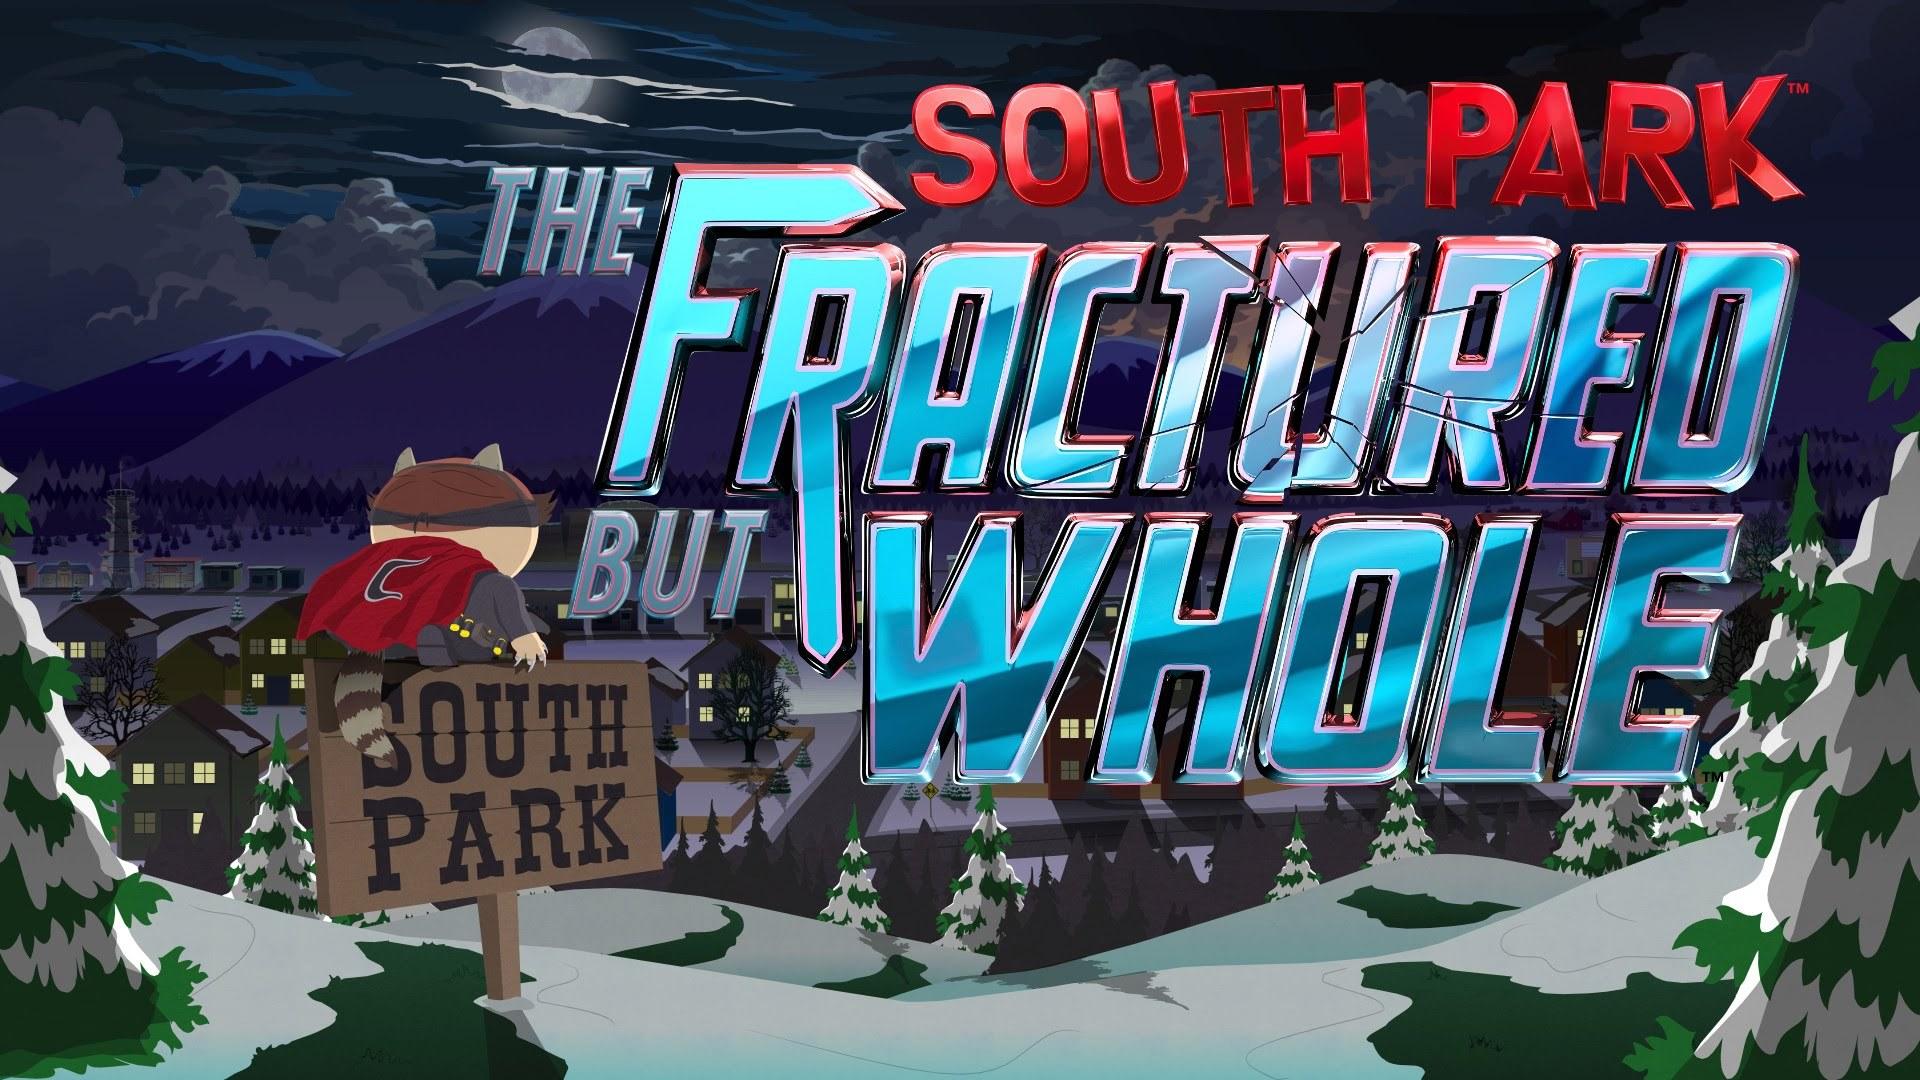 South Park The Fractured But Whole South Park Archives FANDOM 1920x1080